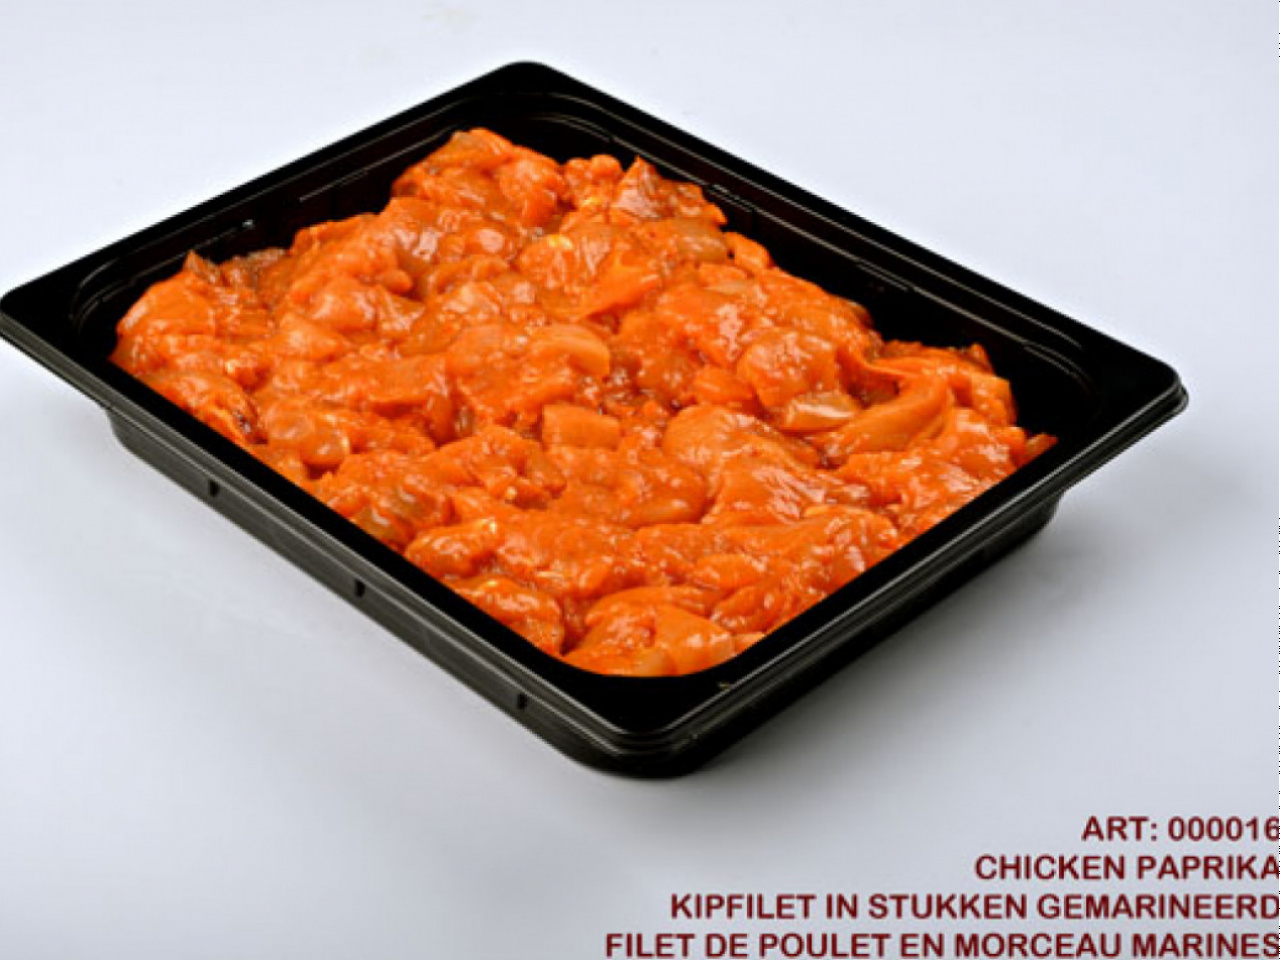 Chicken Paprika Frozen 5kg In Trays